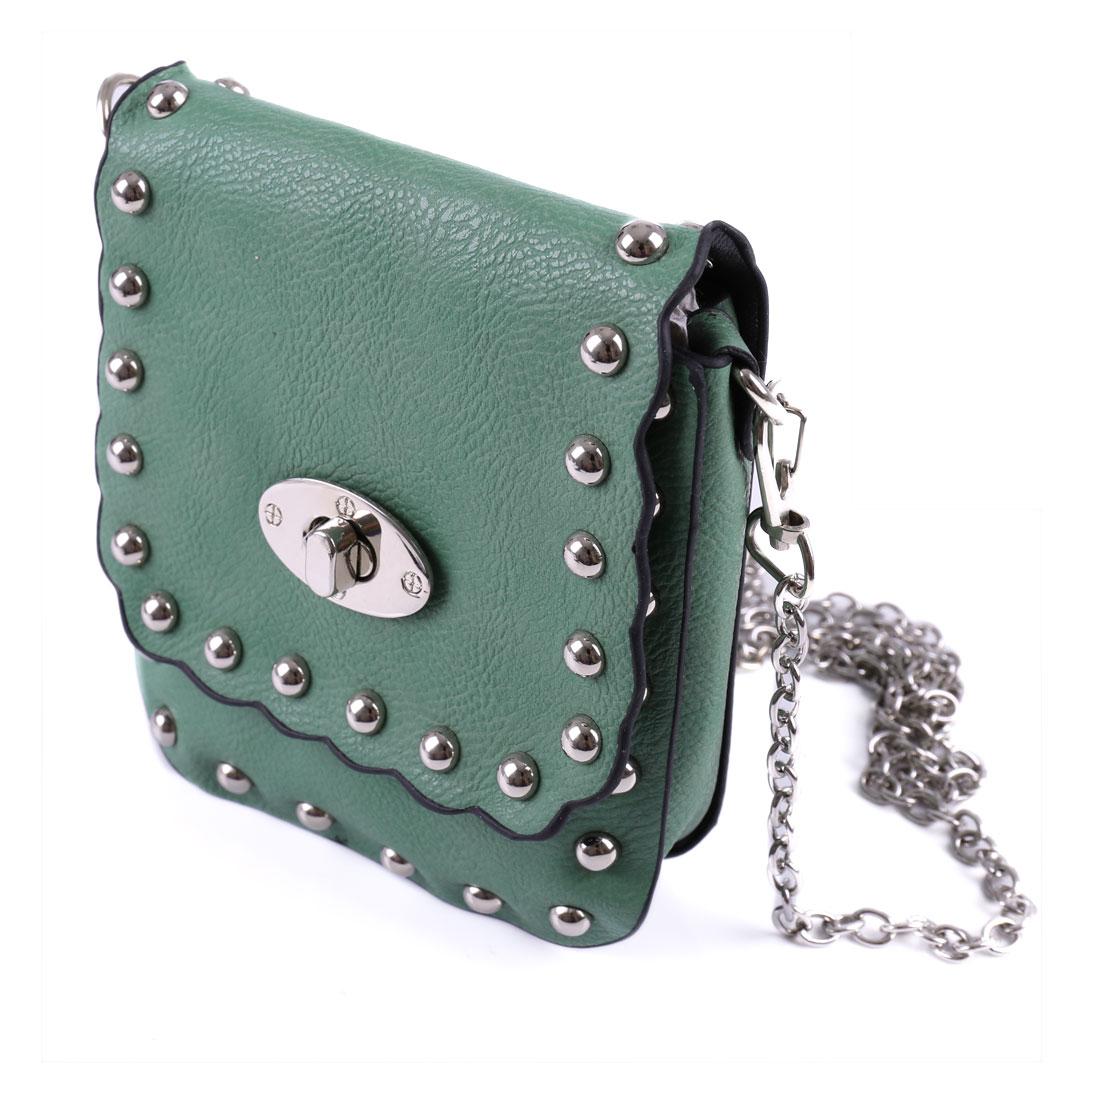 Woman Stud Decor Green Faux Leather Turn Lock Clasp Crossbody Bag Handbag